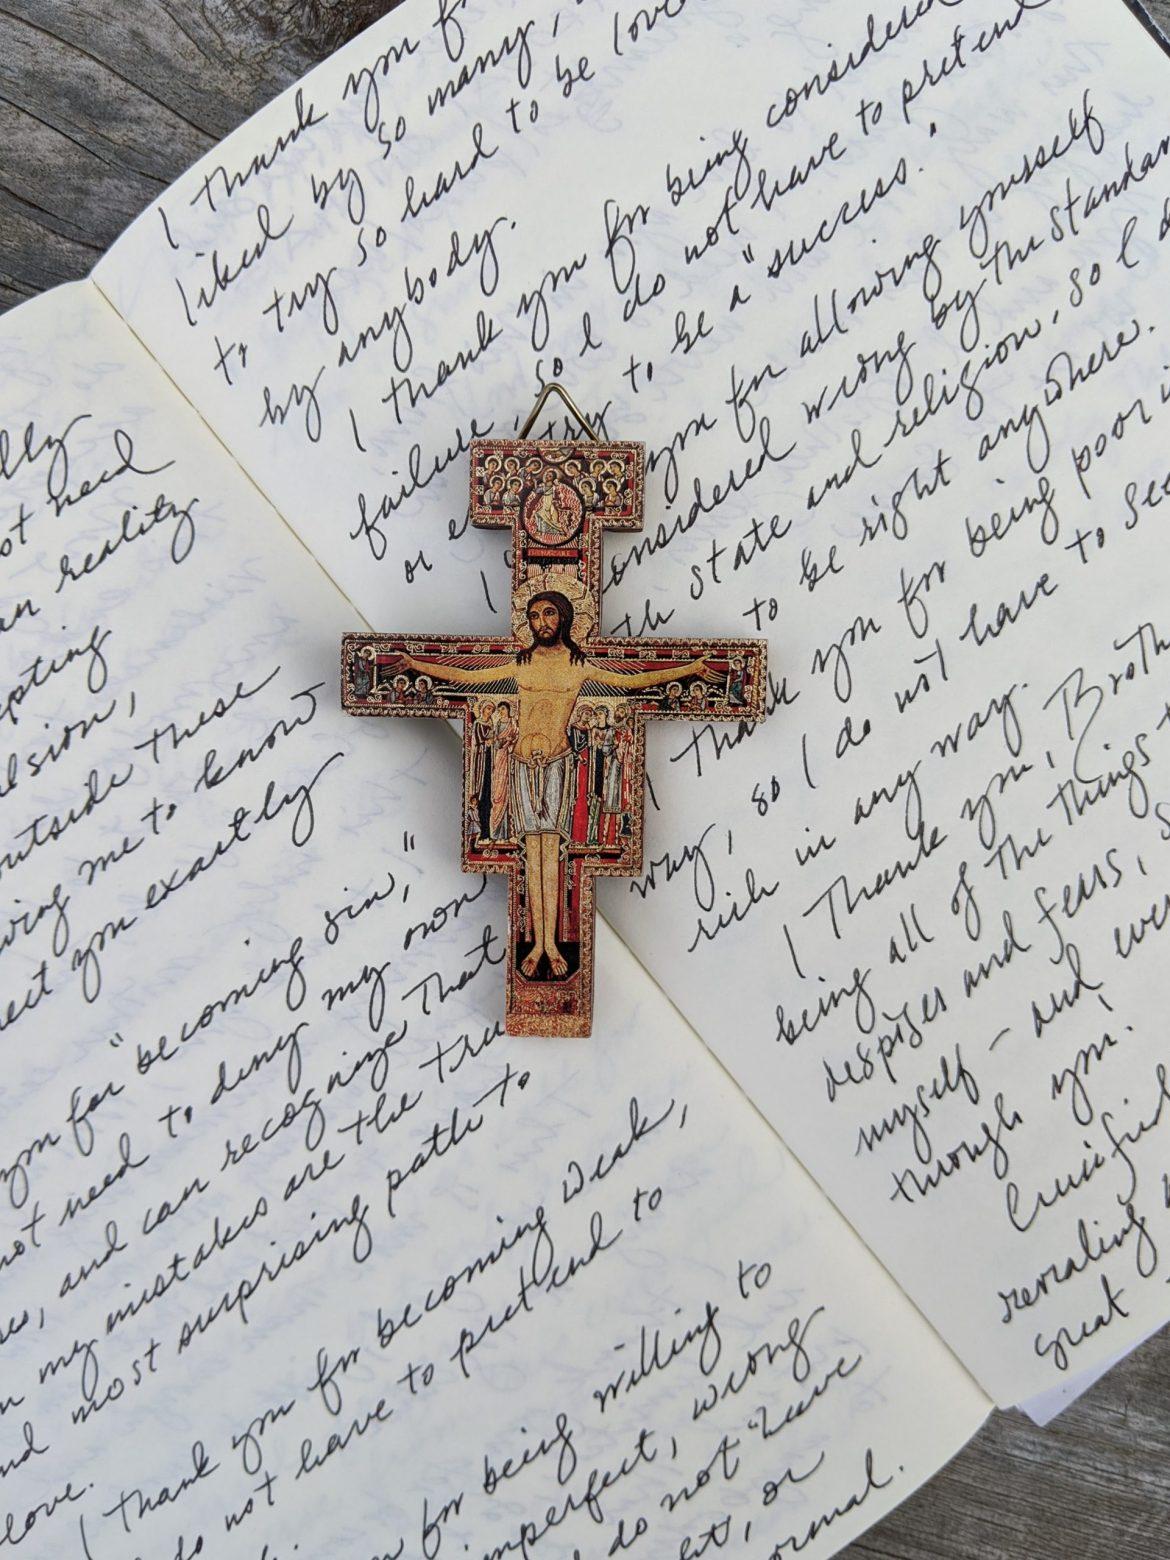 Richard Rohr Meditation On Jesus on the cross